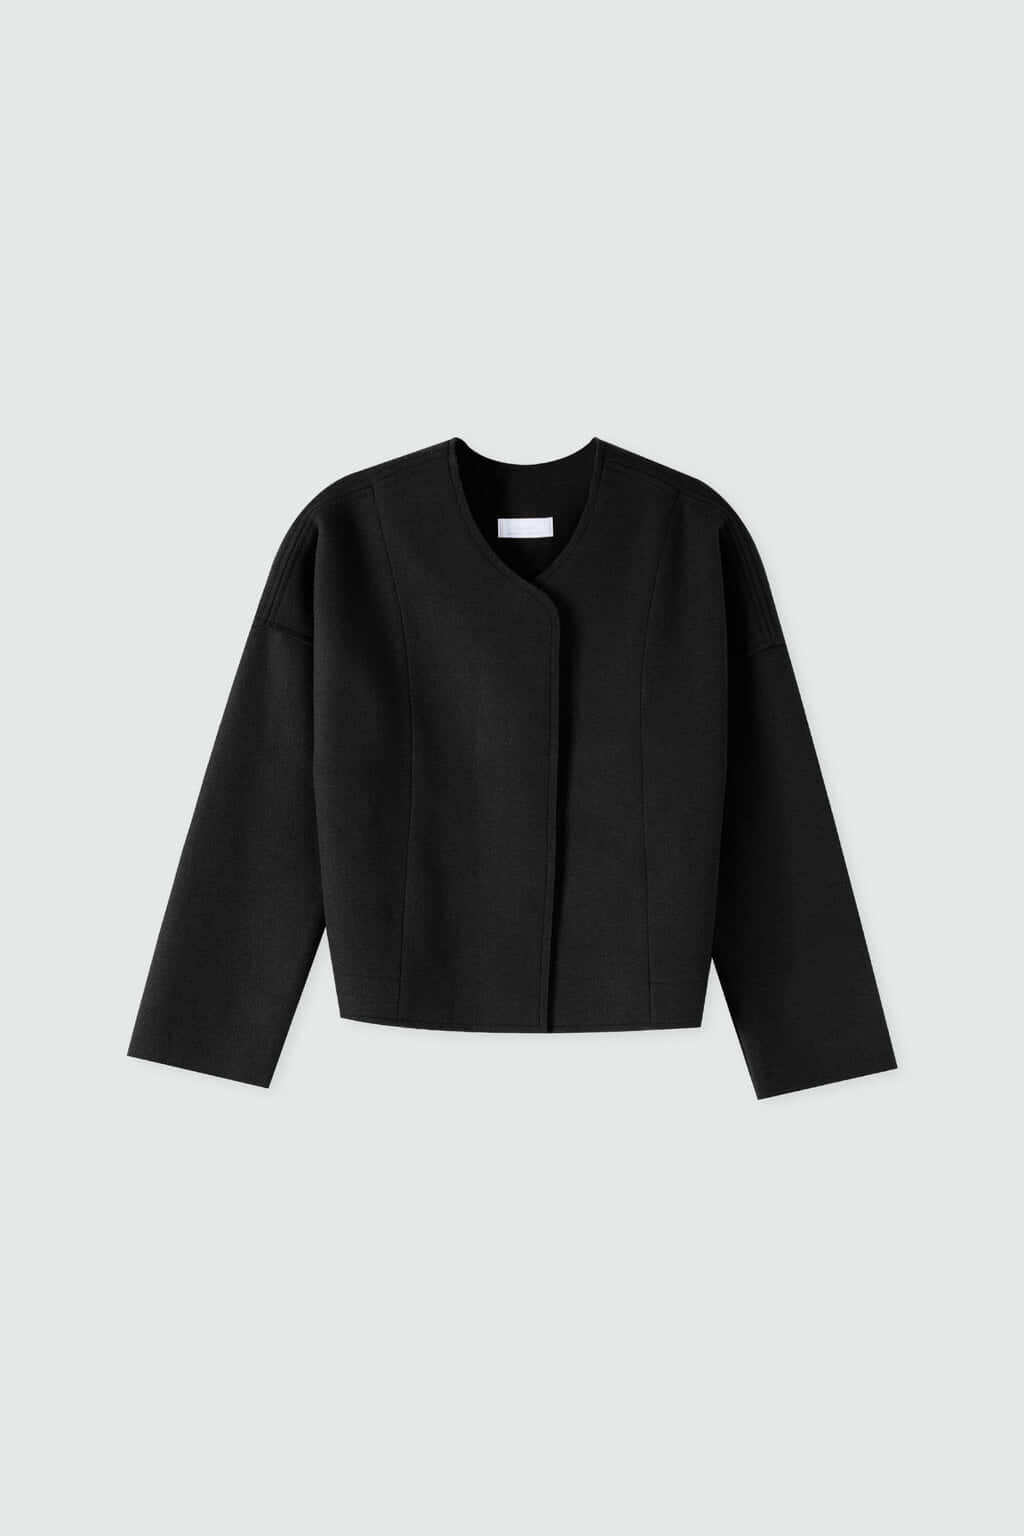 Jacket 2591 Black 10